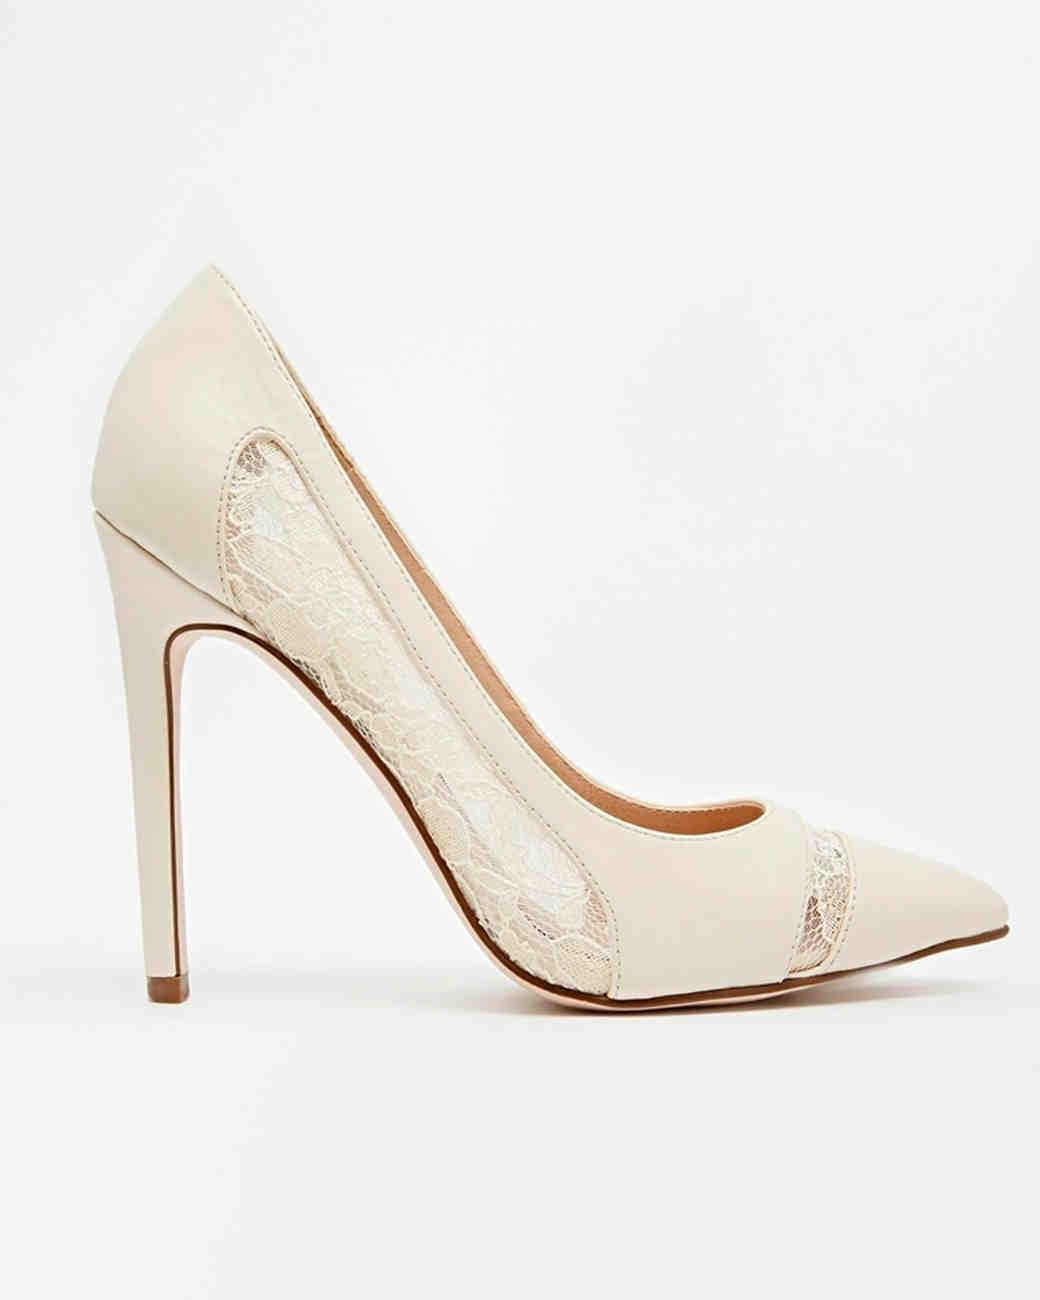 summer-wedding-shoes-asos-petition-heels-0515.jpg